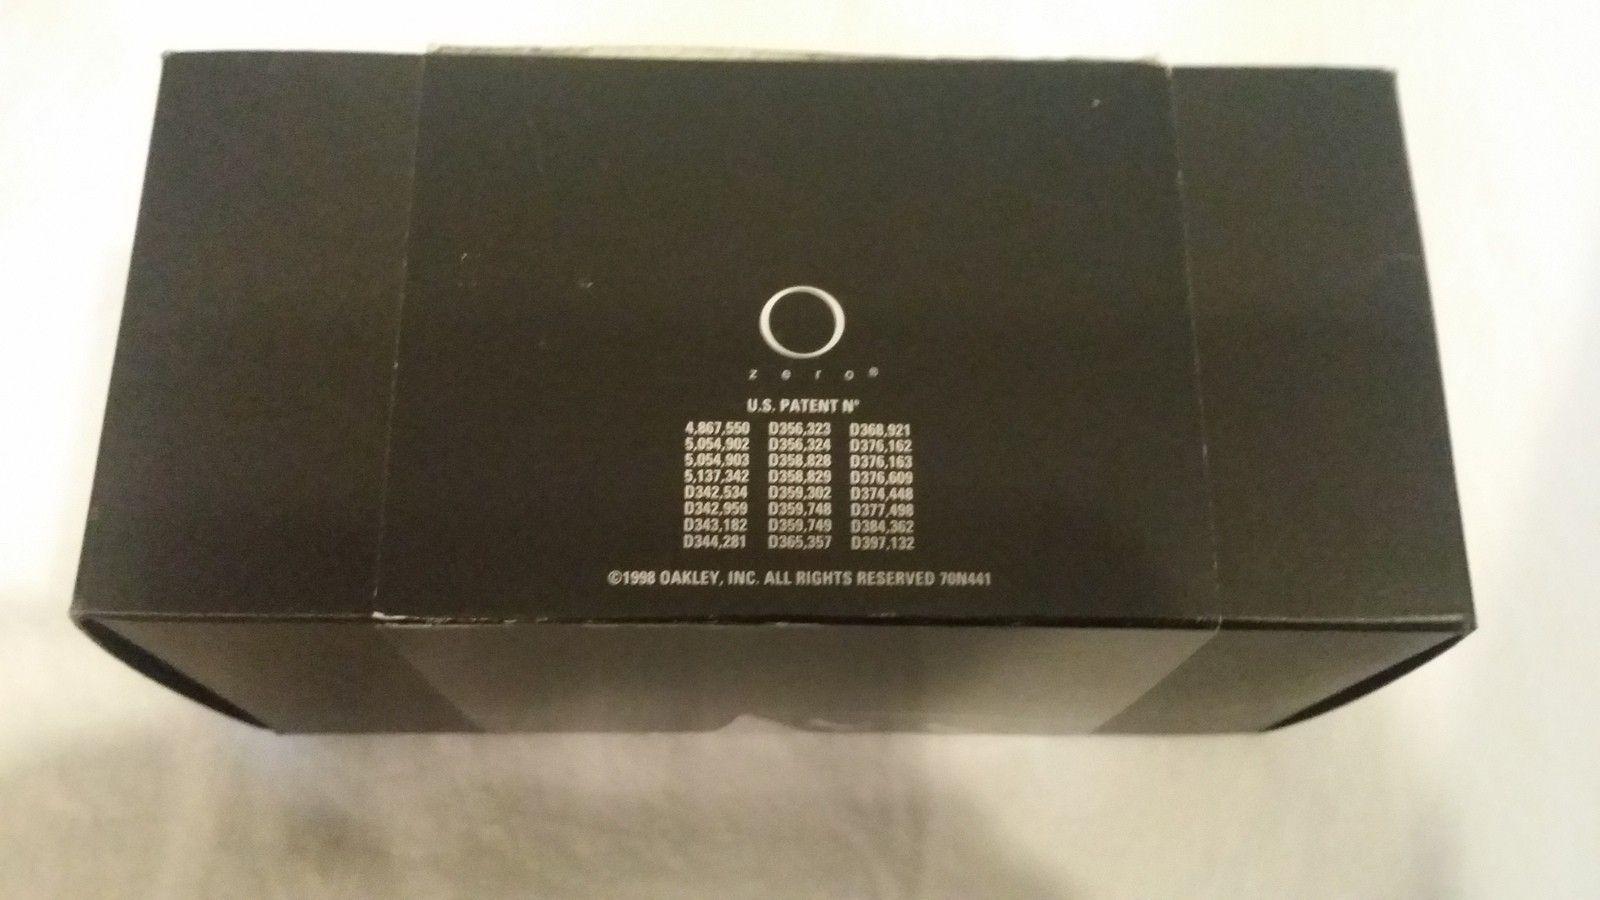 Anyone need a box? - 20150831_184128.jpg